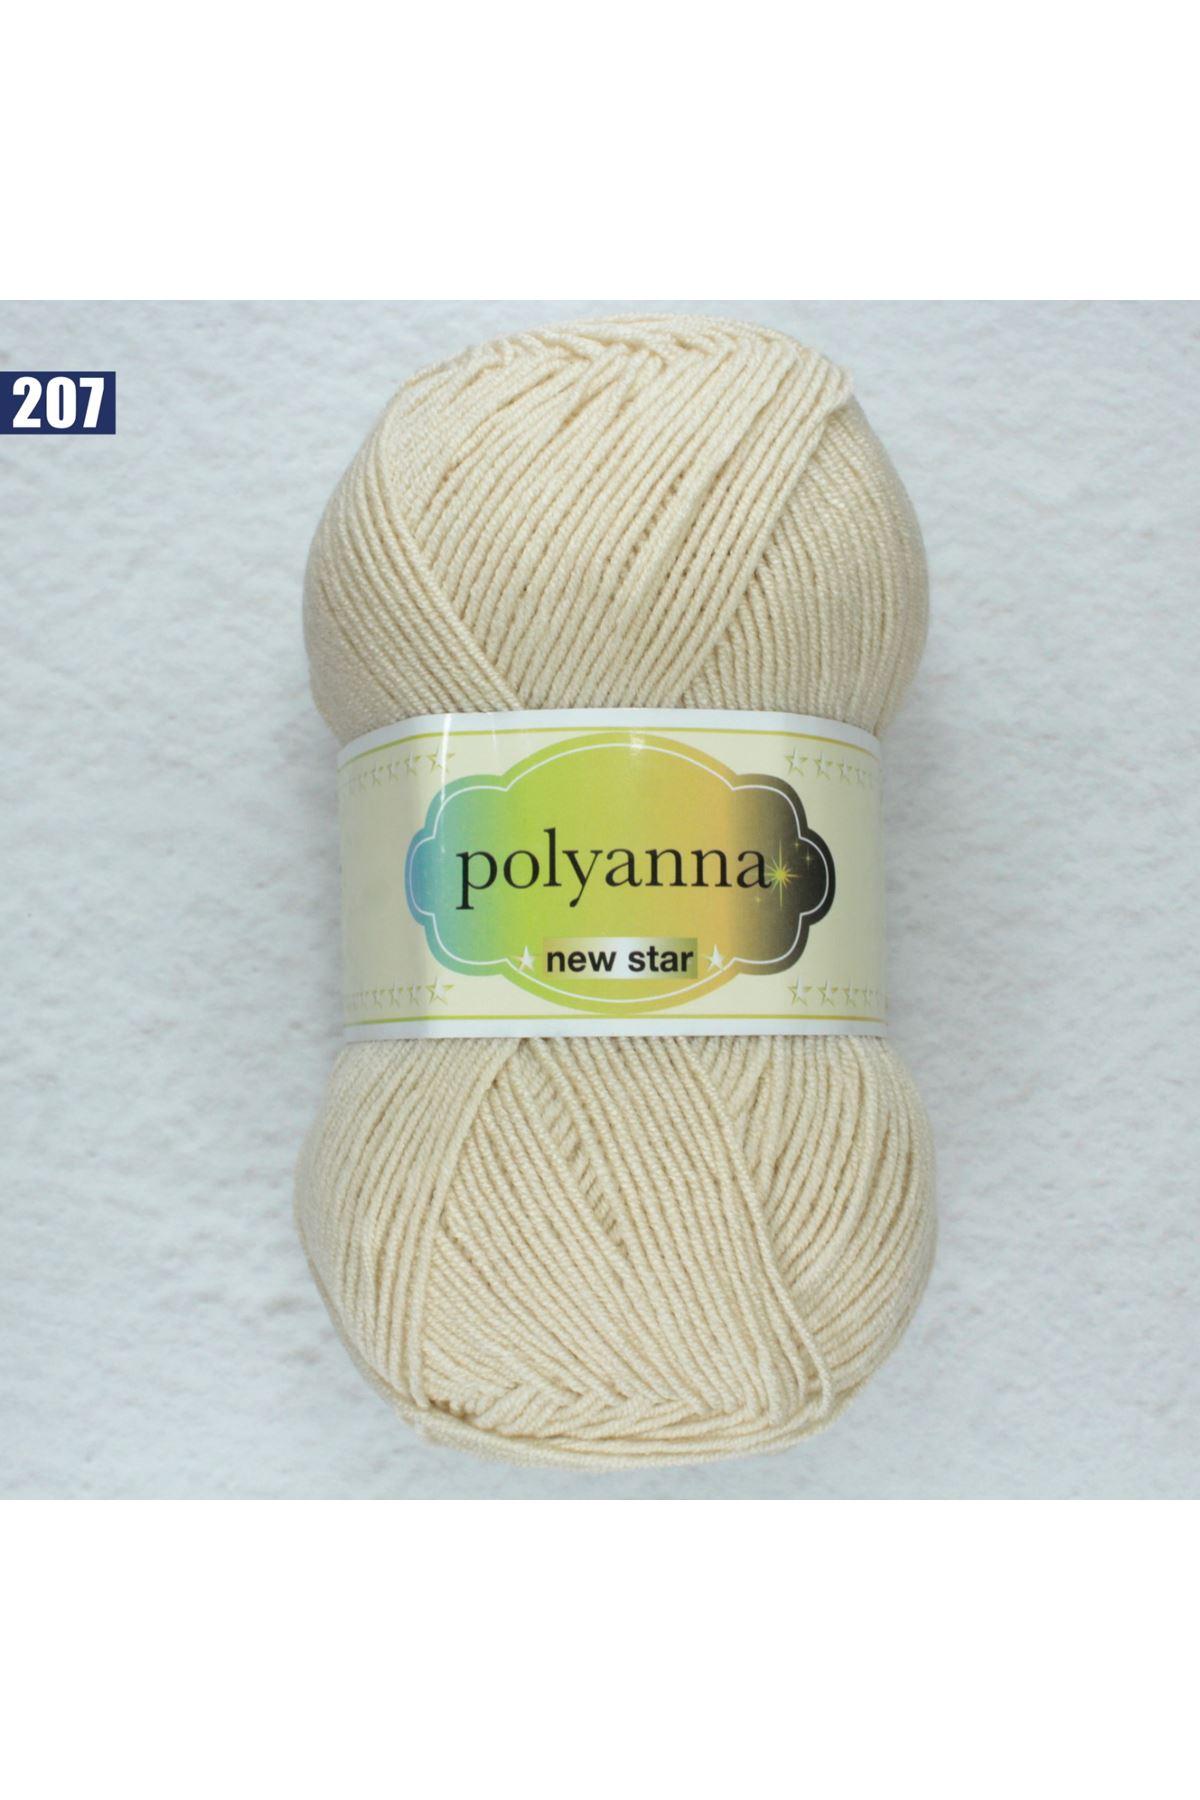 Polyanna New Star 207